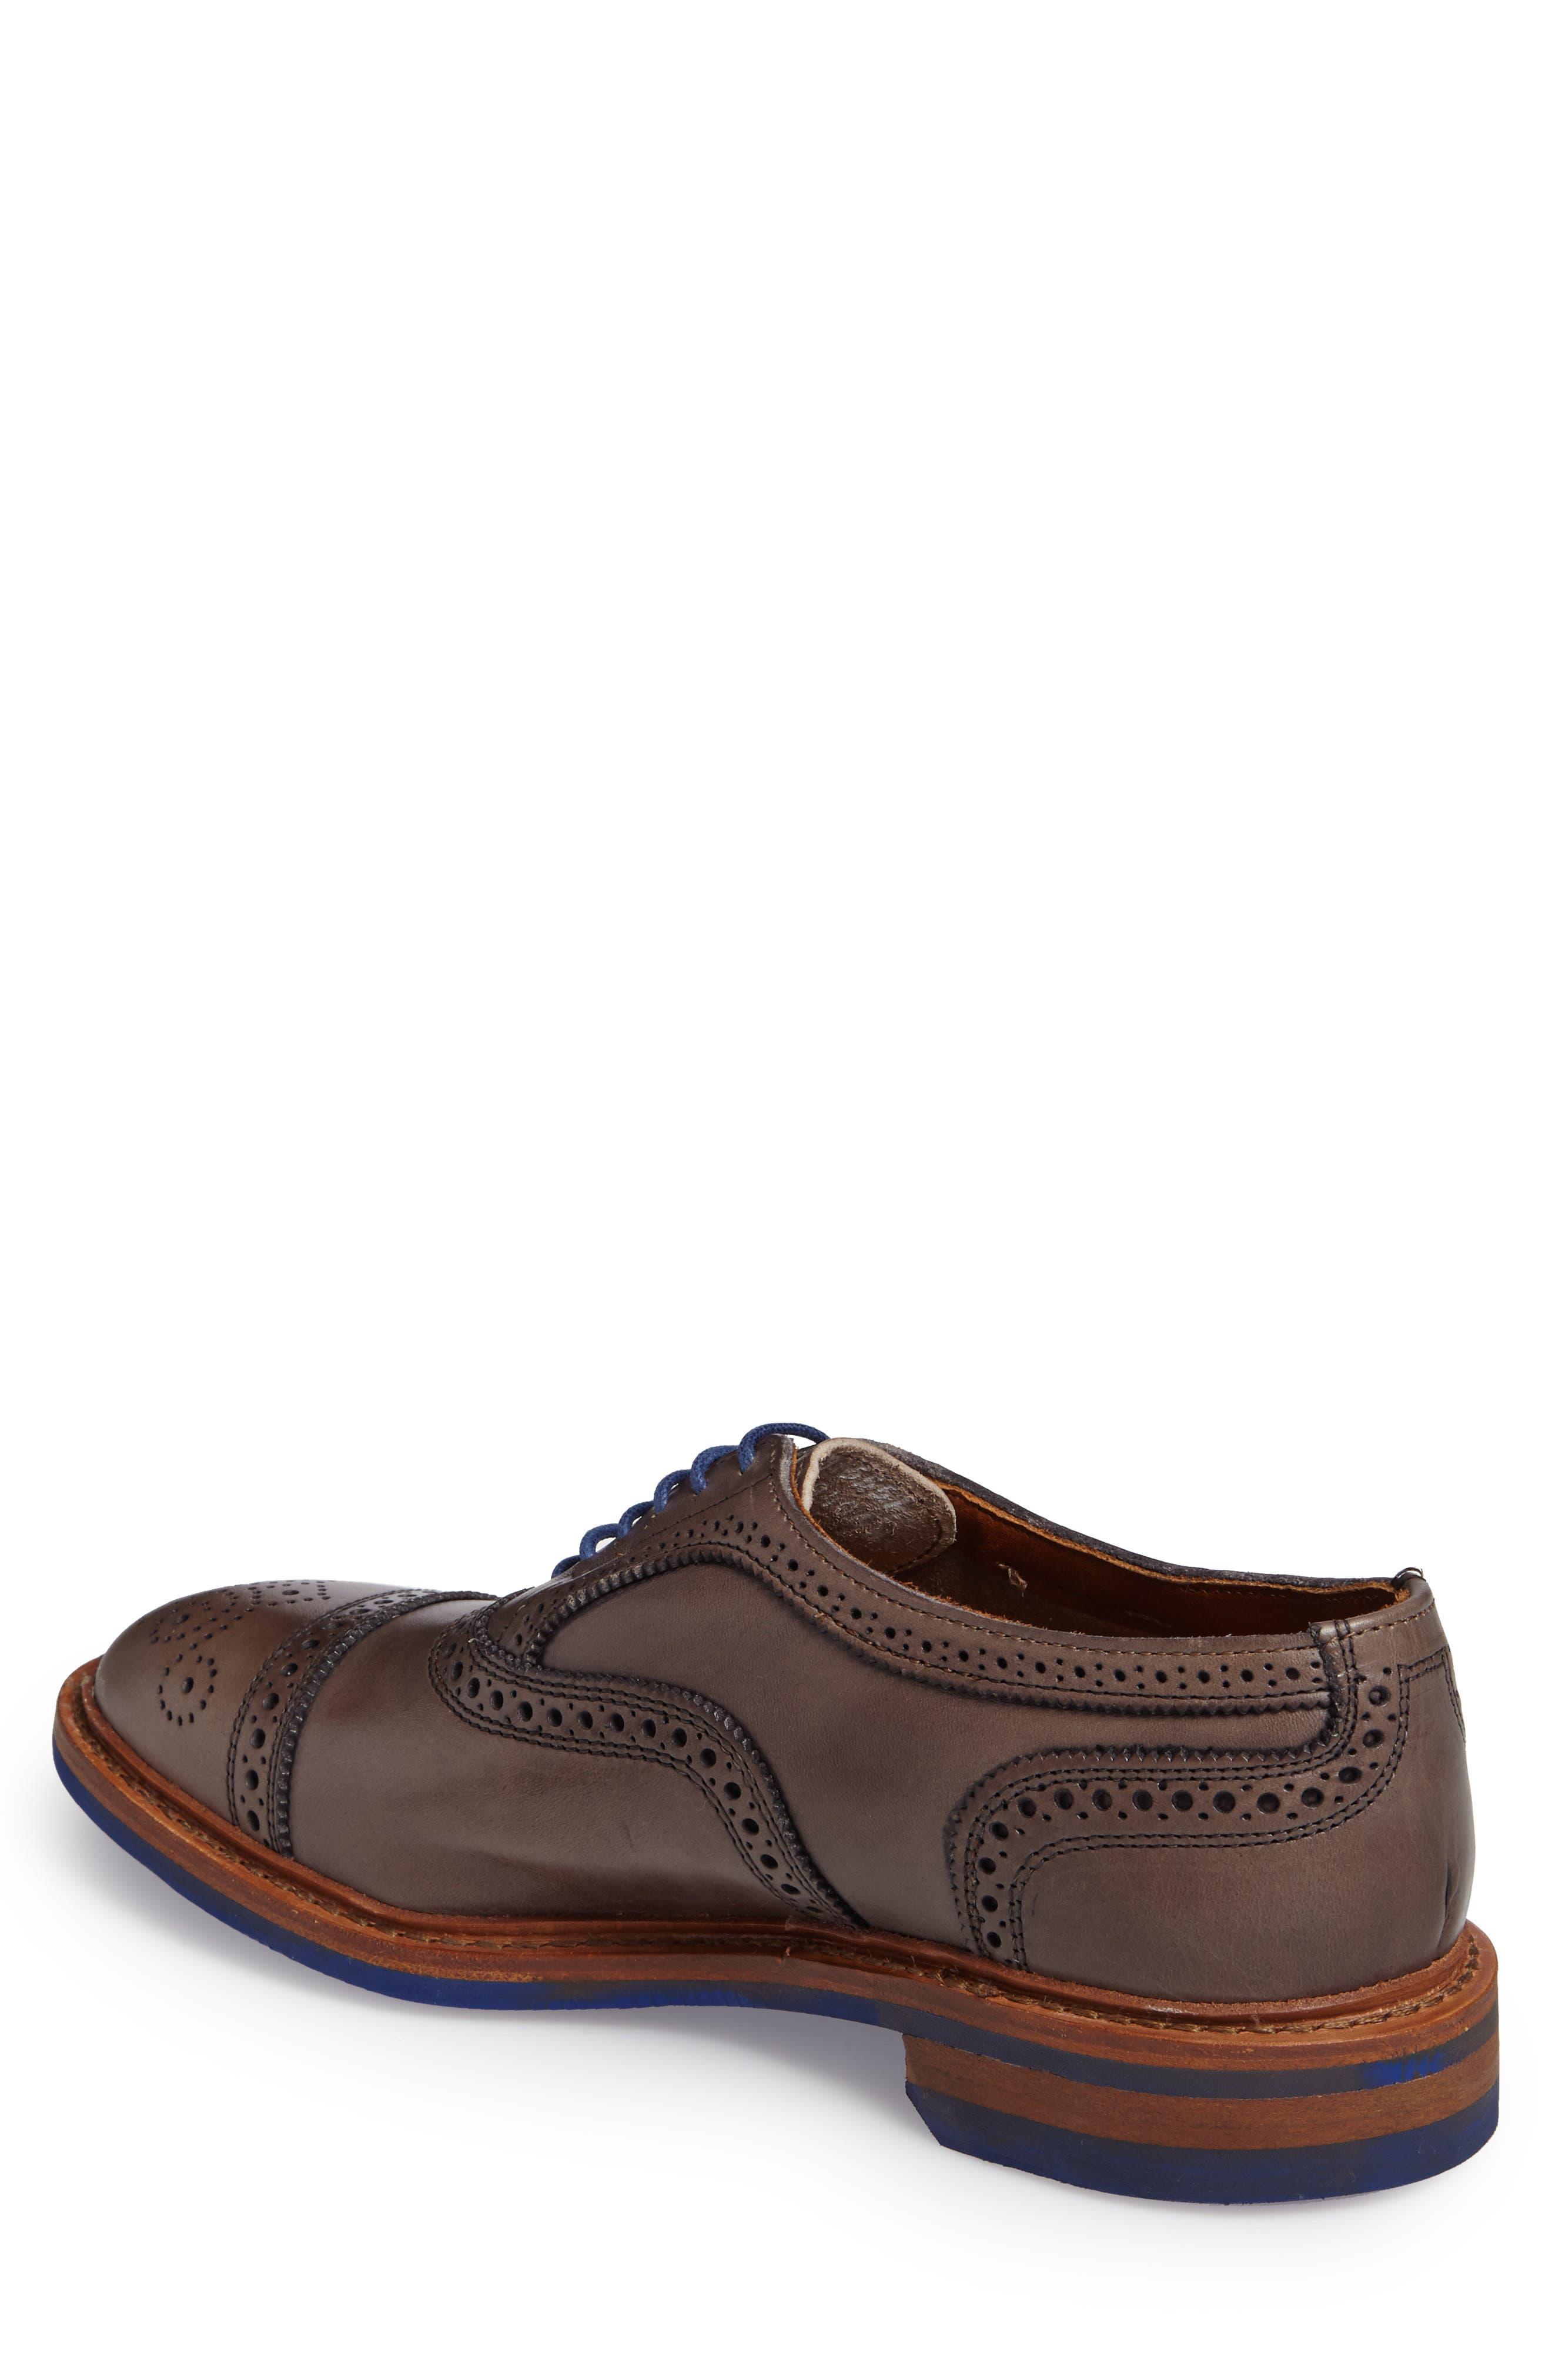 'Strandmok' Cap Toe Oxford,                             Alternate thumbnail 2, color,                             Grey Leather